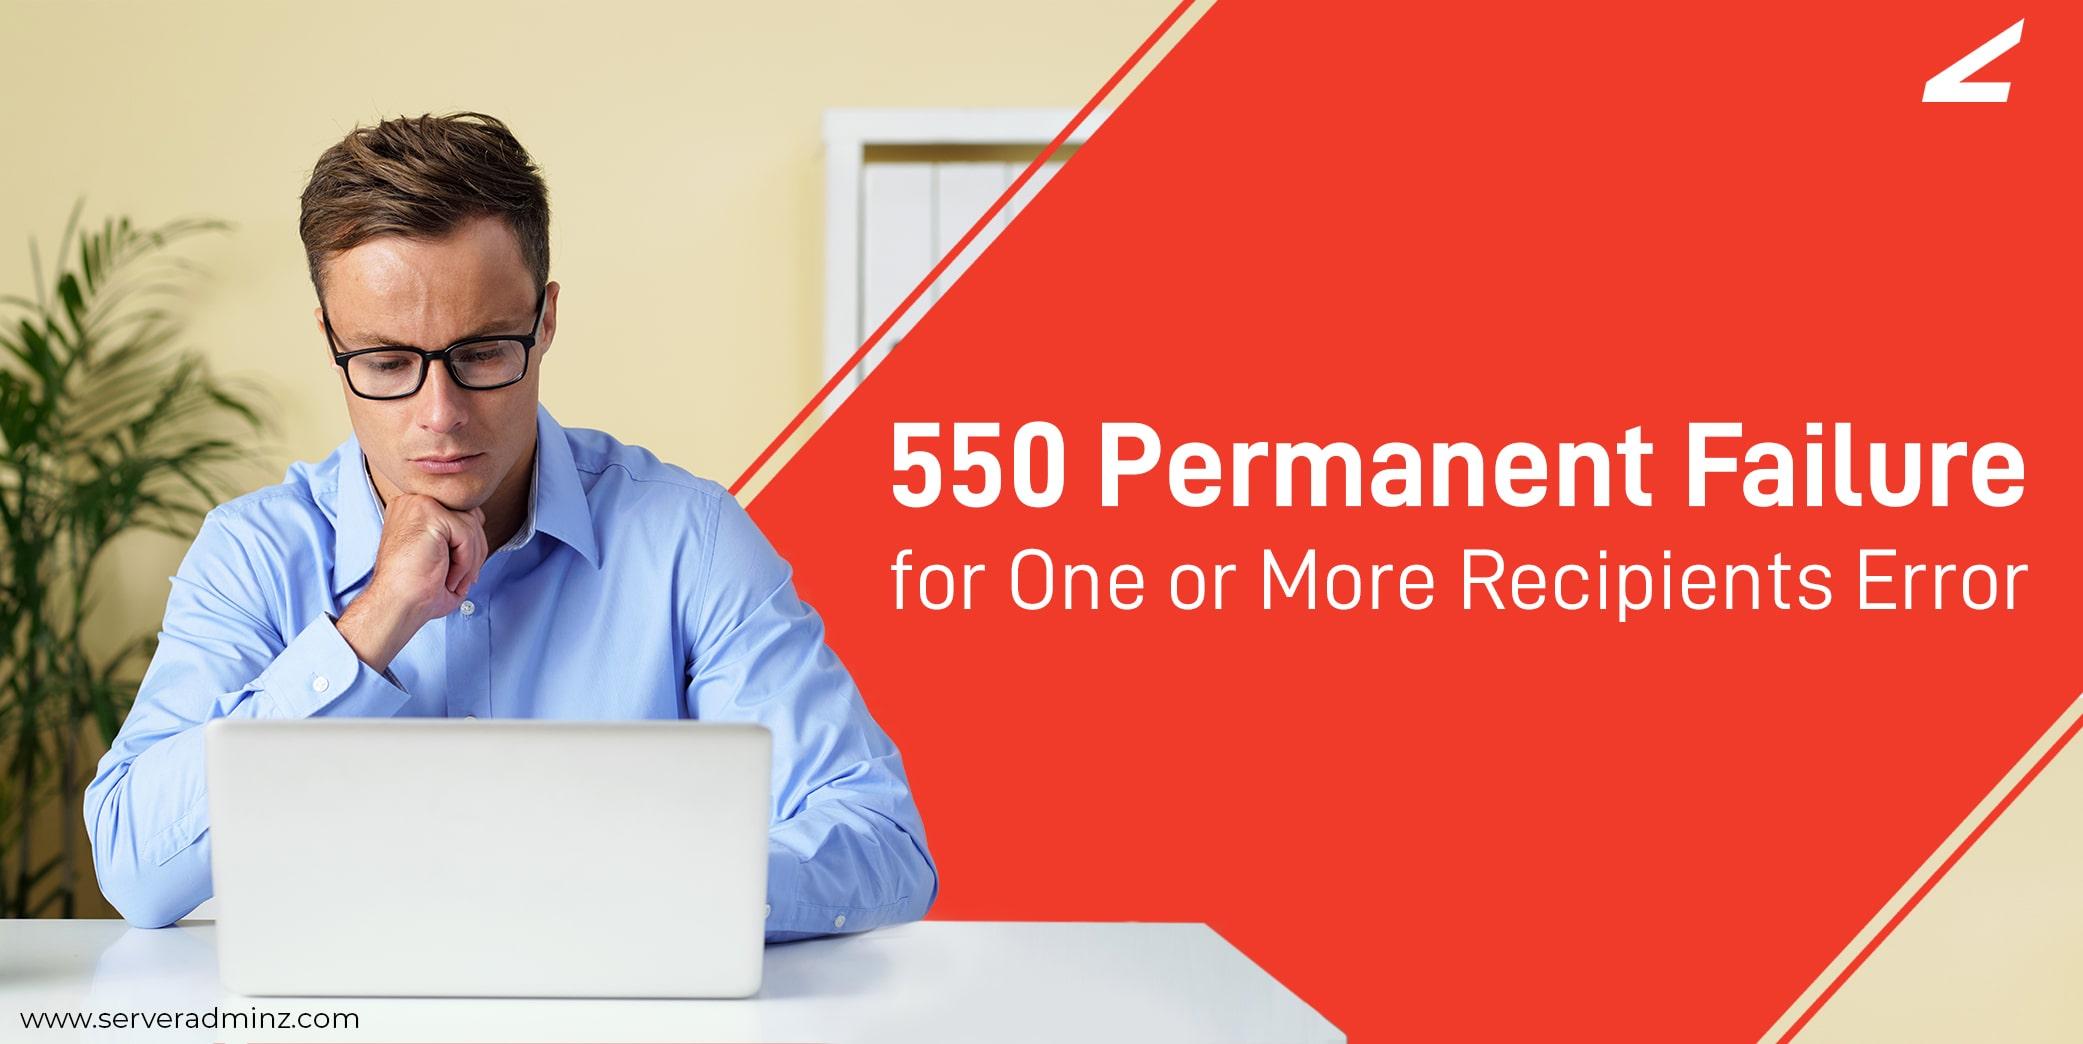 550 Permanent Failure for One or More Recipients Error